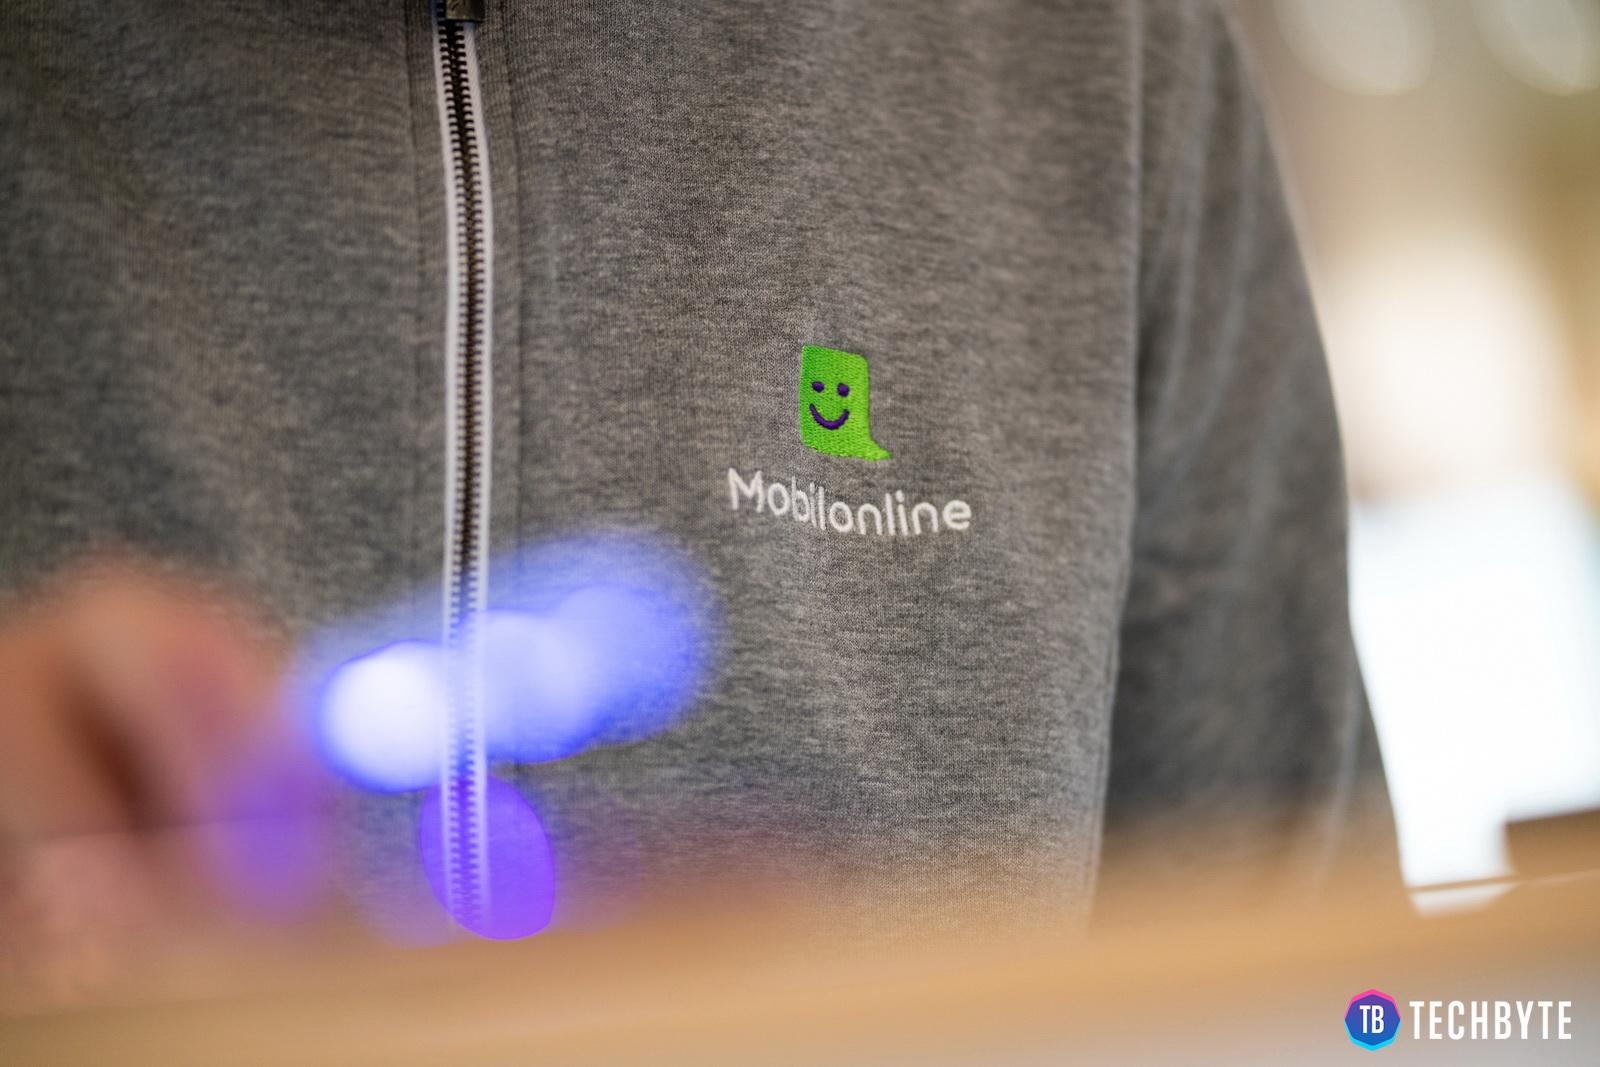 mobilonline 25 0